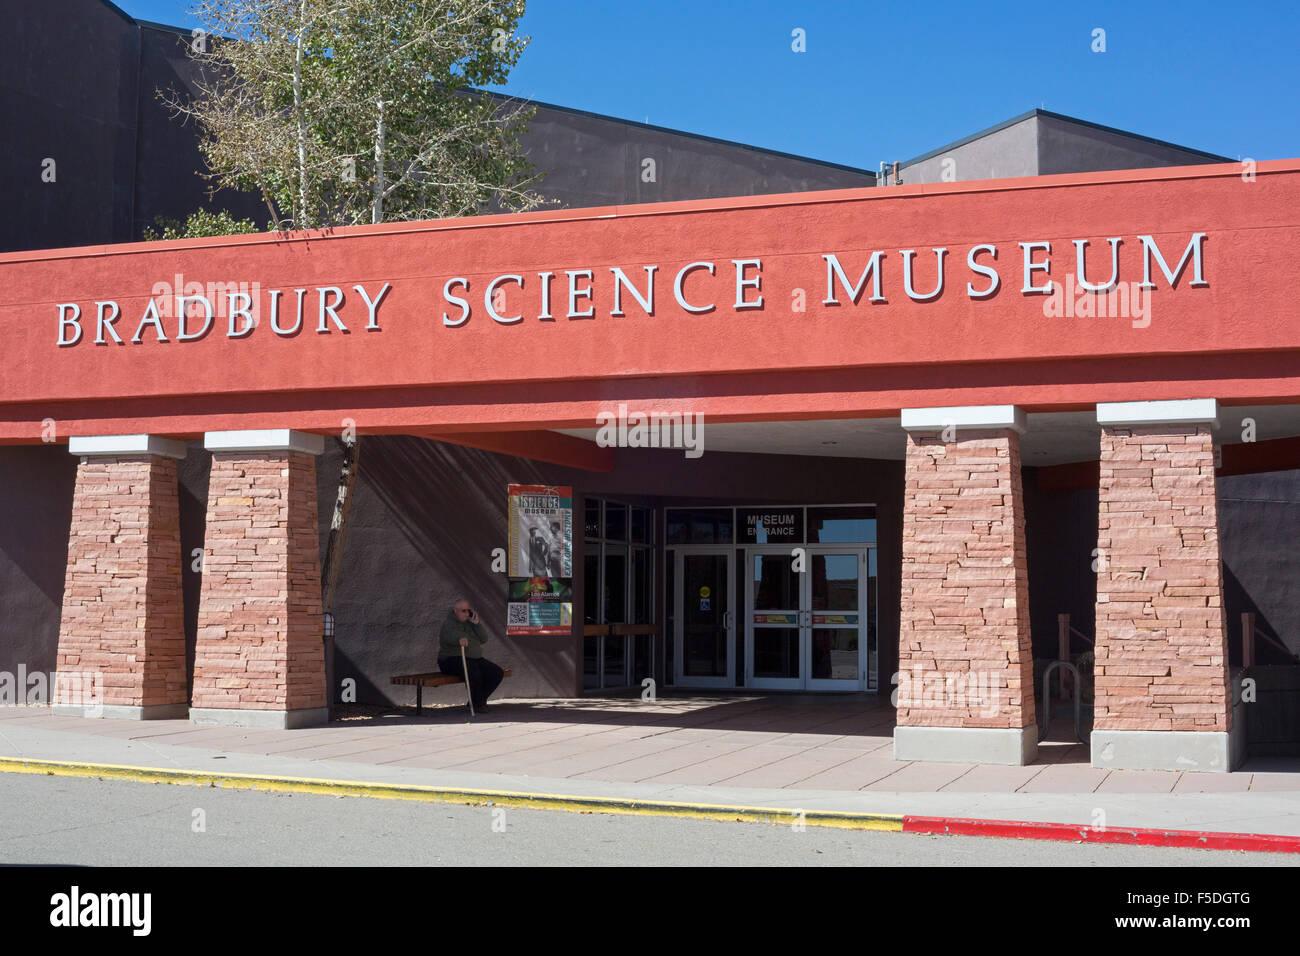 Los Alamos, New Mexico - The Bradbury Science Museum contains exhibits about Los Alamos National Laboratory. - Stock Image